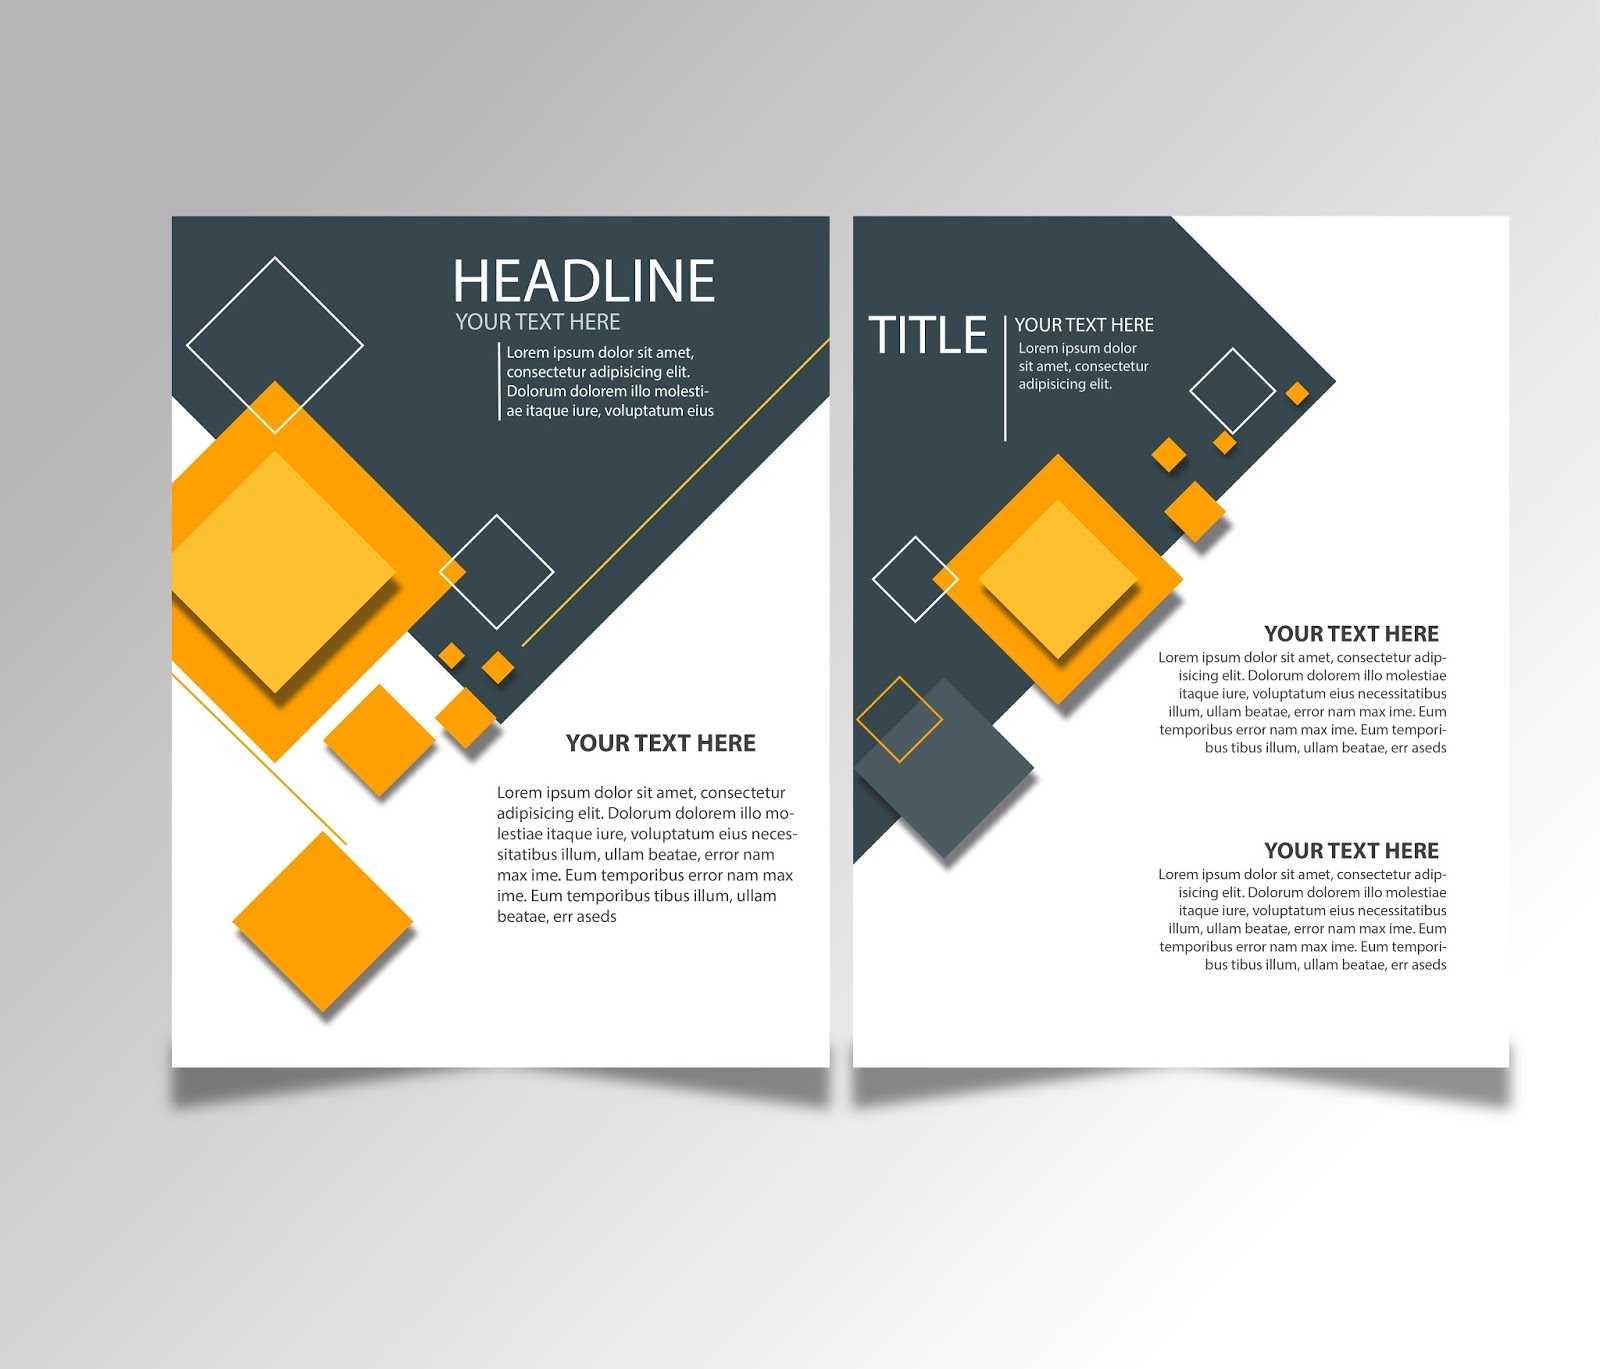 Free Download Brochure Design Templates Ai Files - Ideosprocess Inside Brochure Template Illustrator Free Download